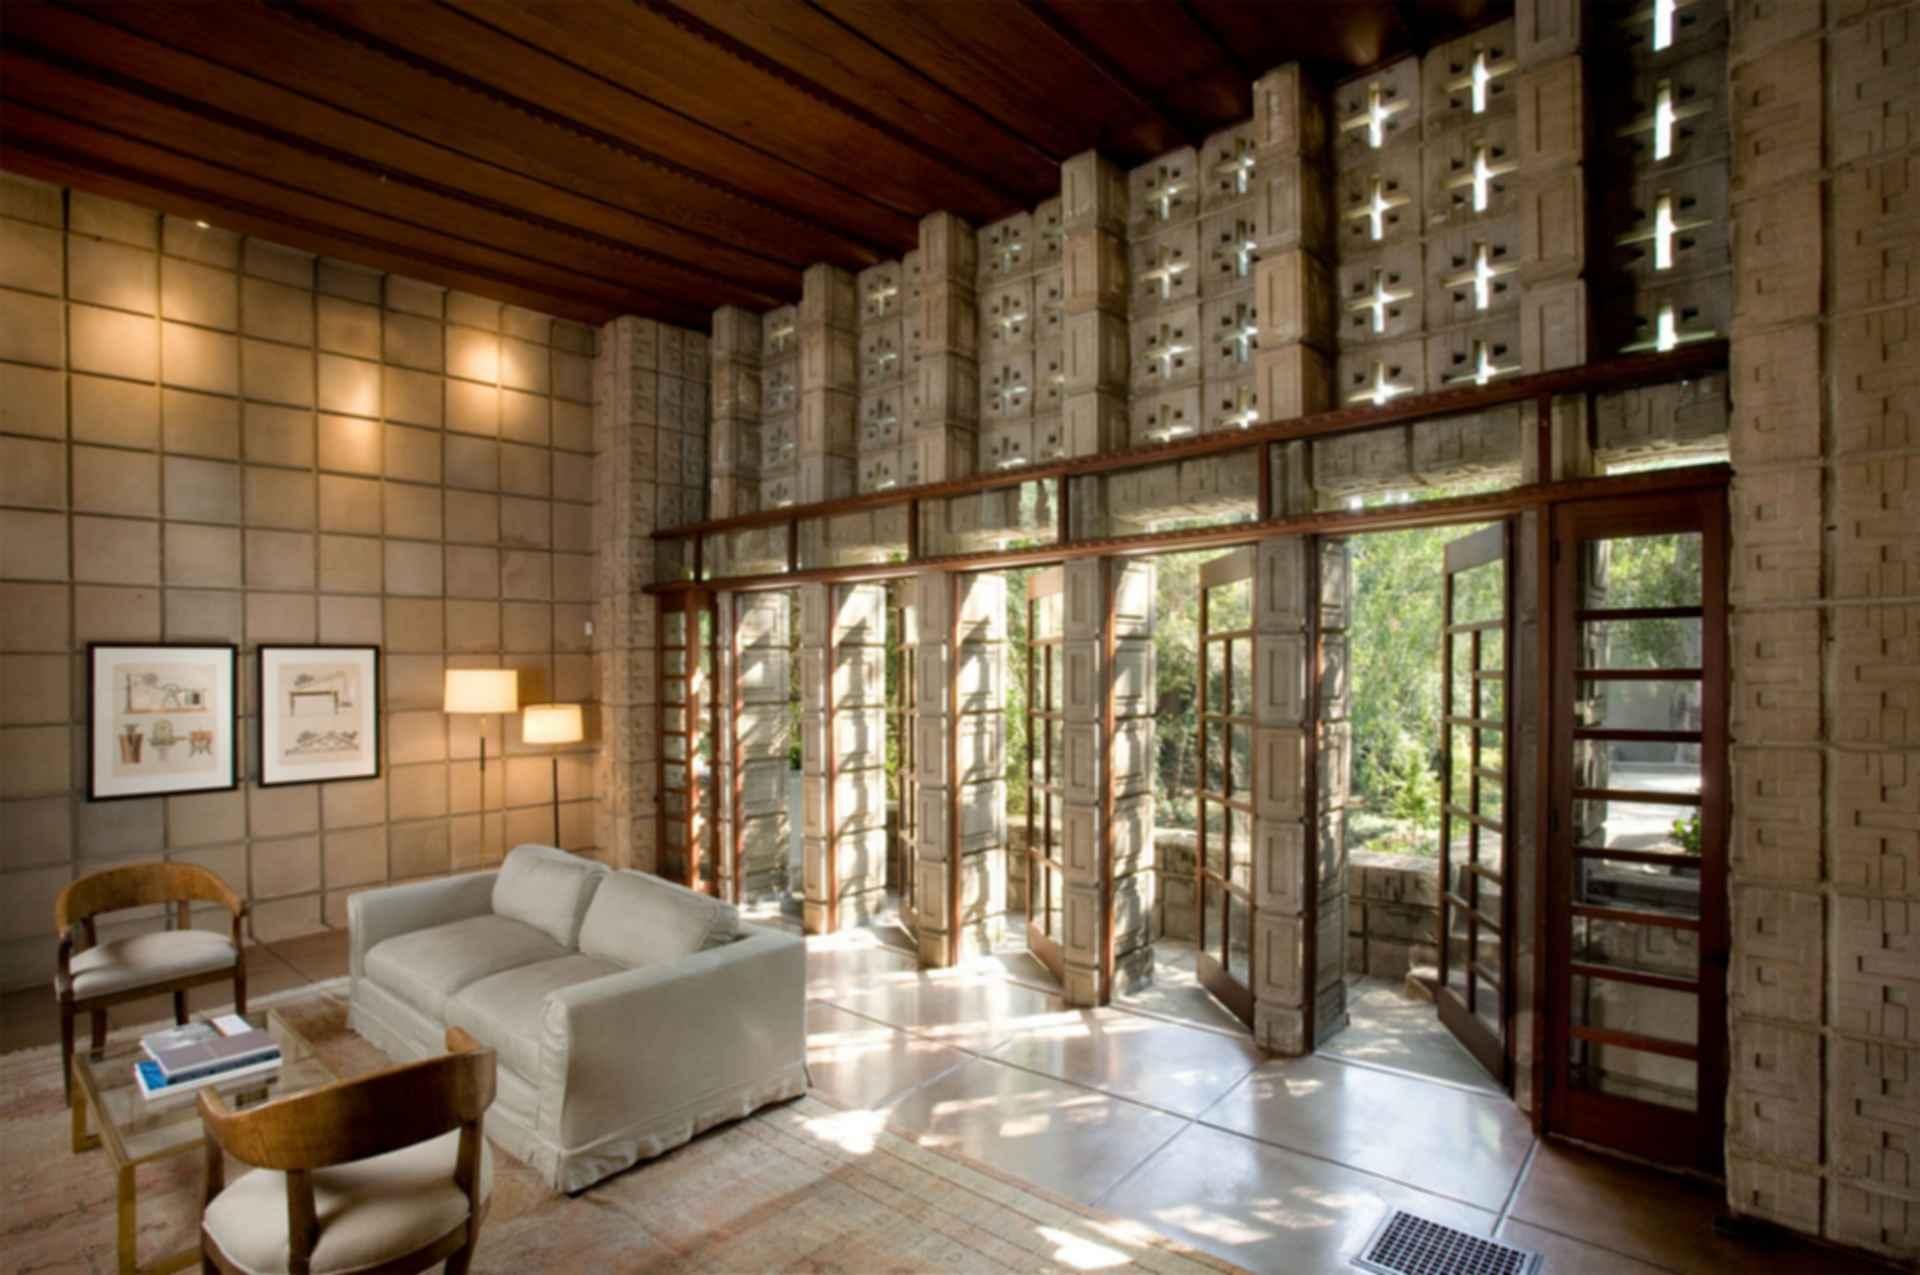 Ennis House - Interior